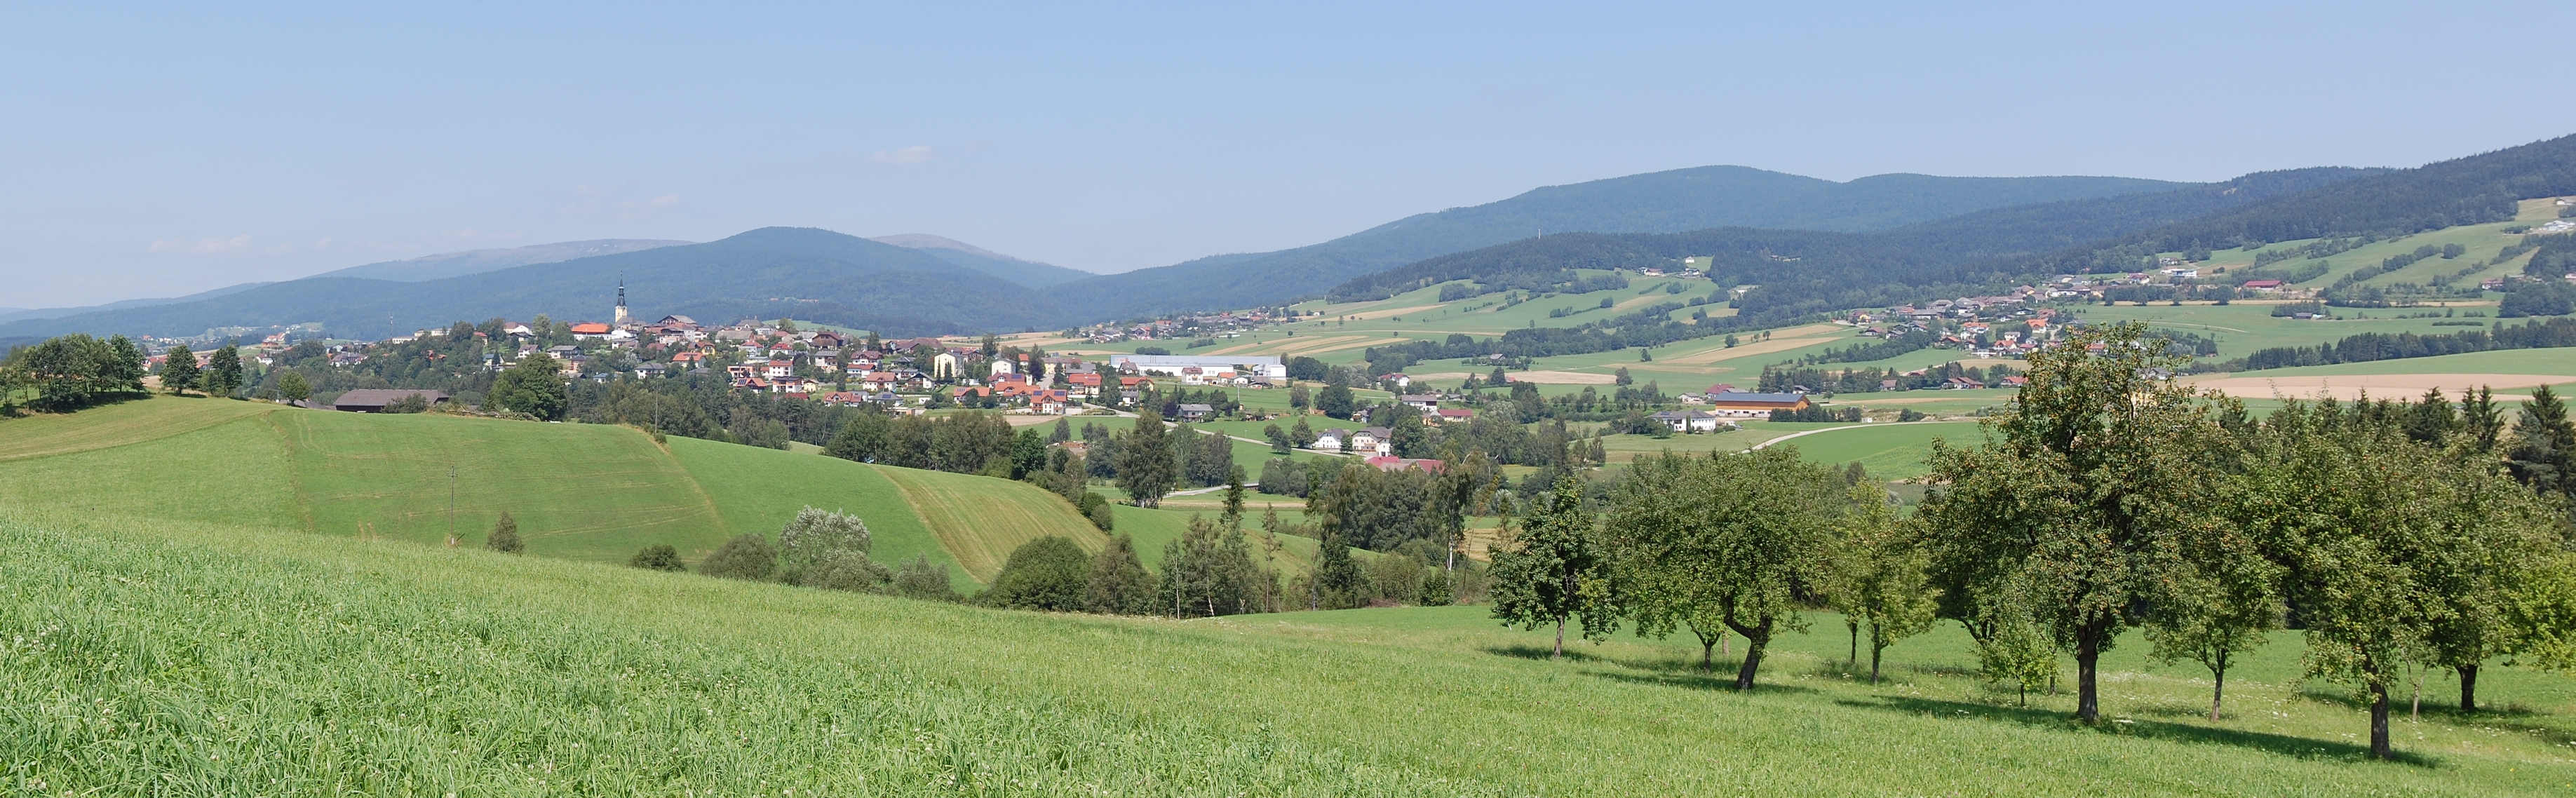 Ulrichsberg frau single, Sexanzeigen in Marbach am Neckar